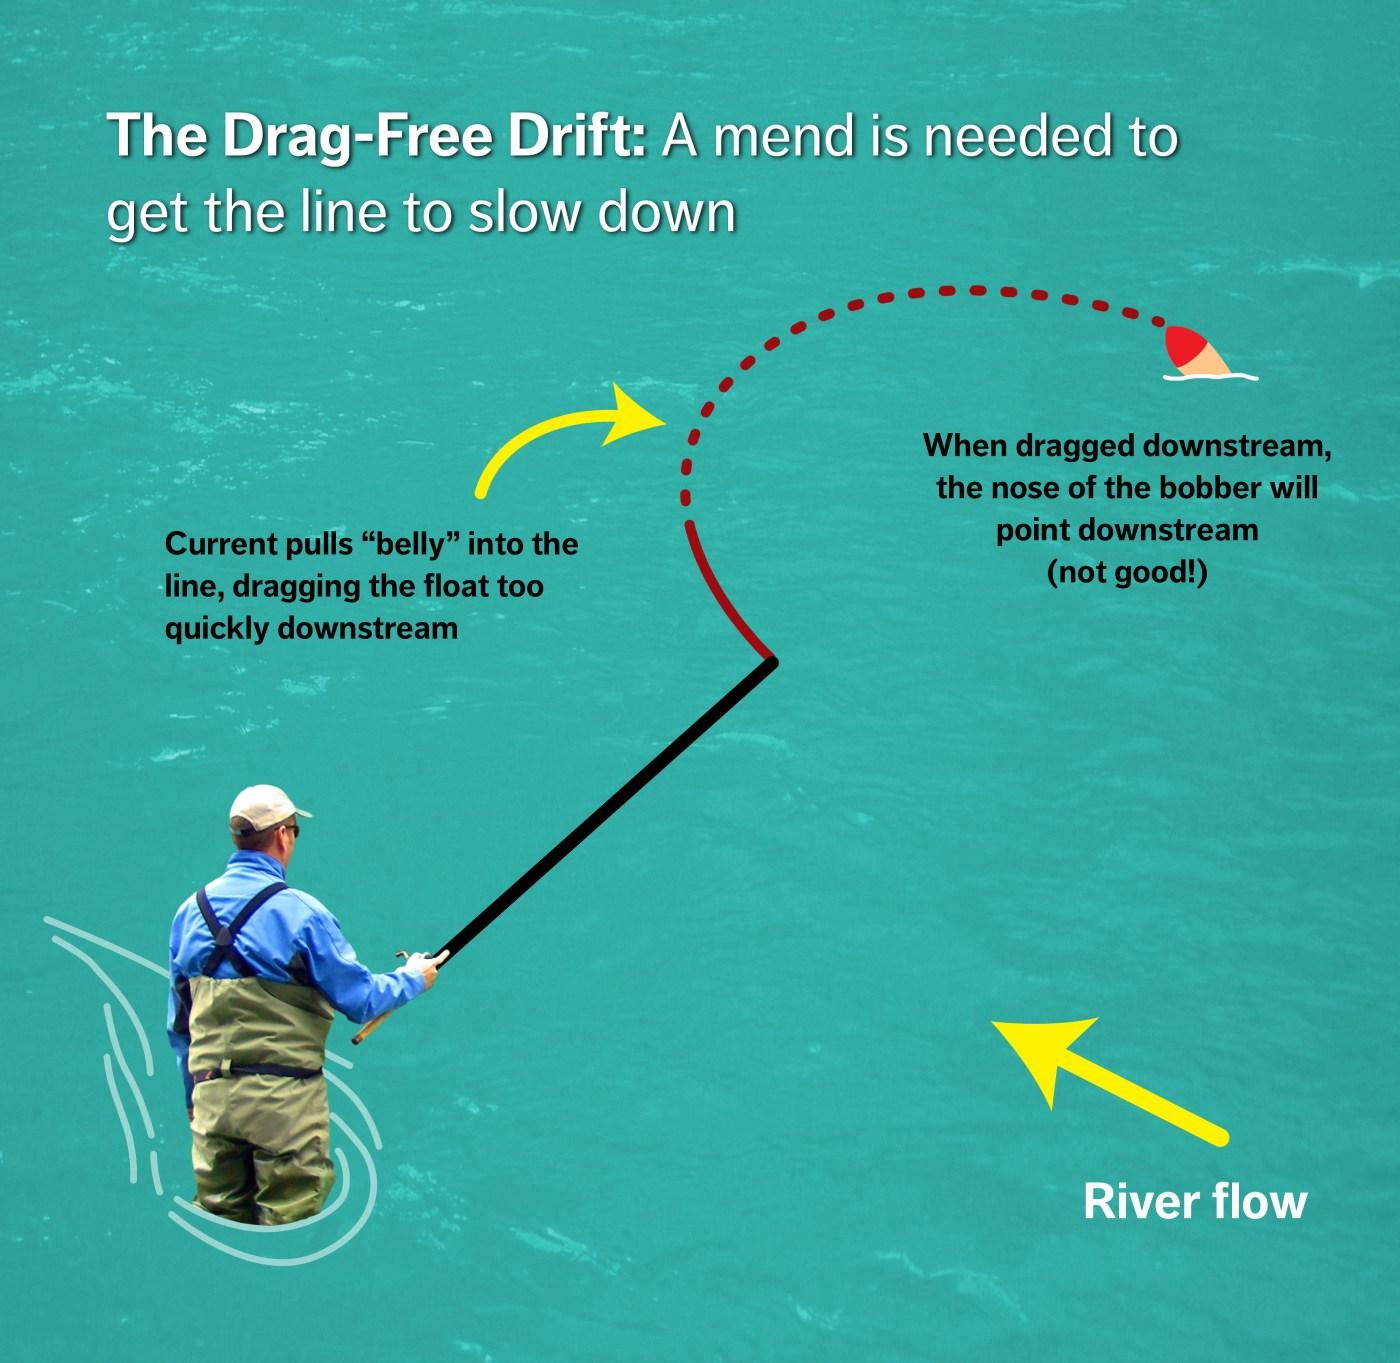 Drag Free drift - mend